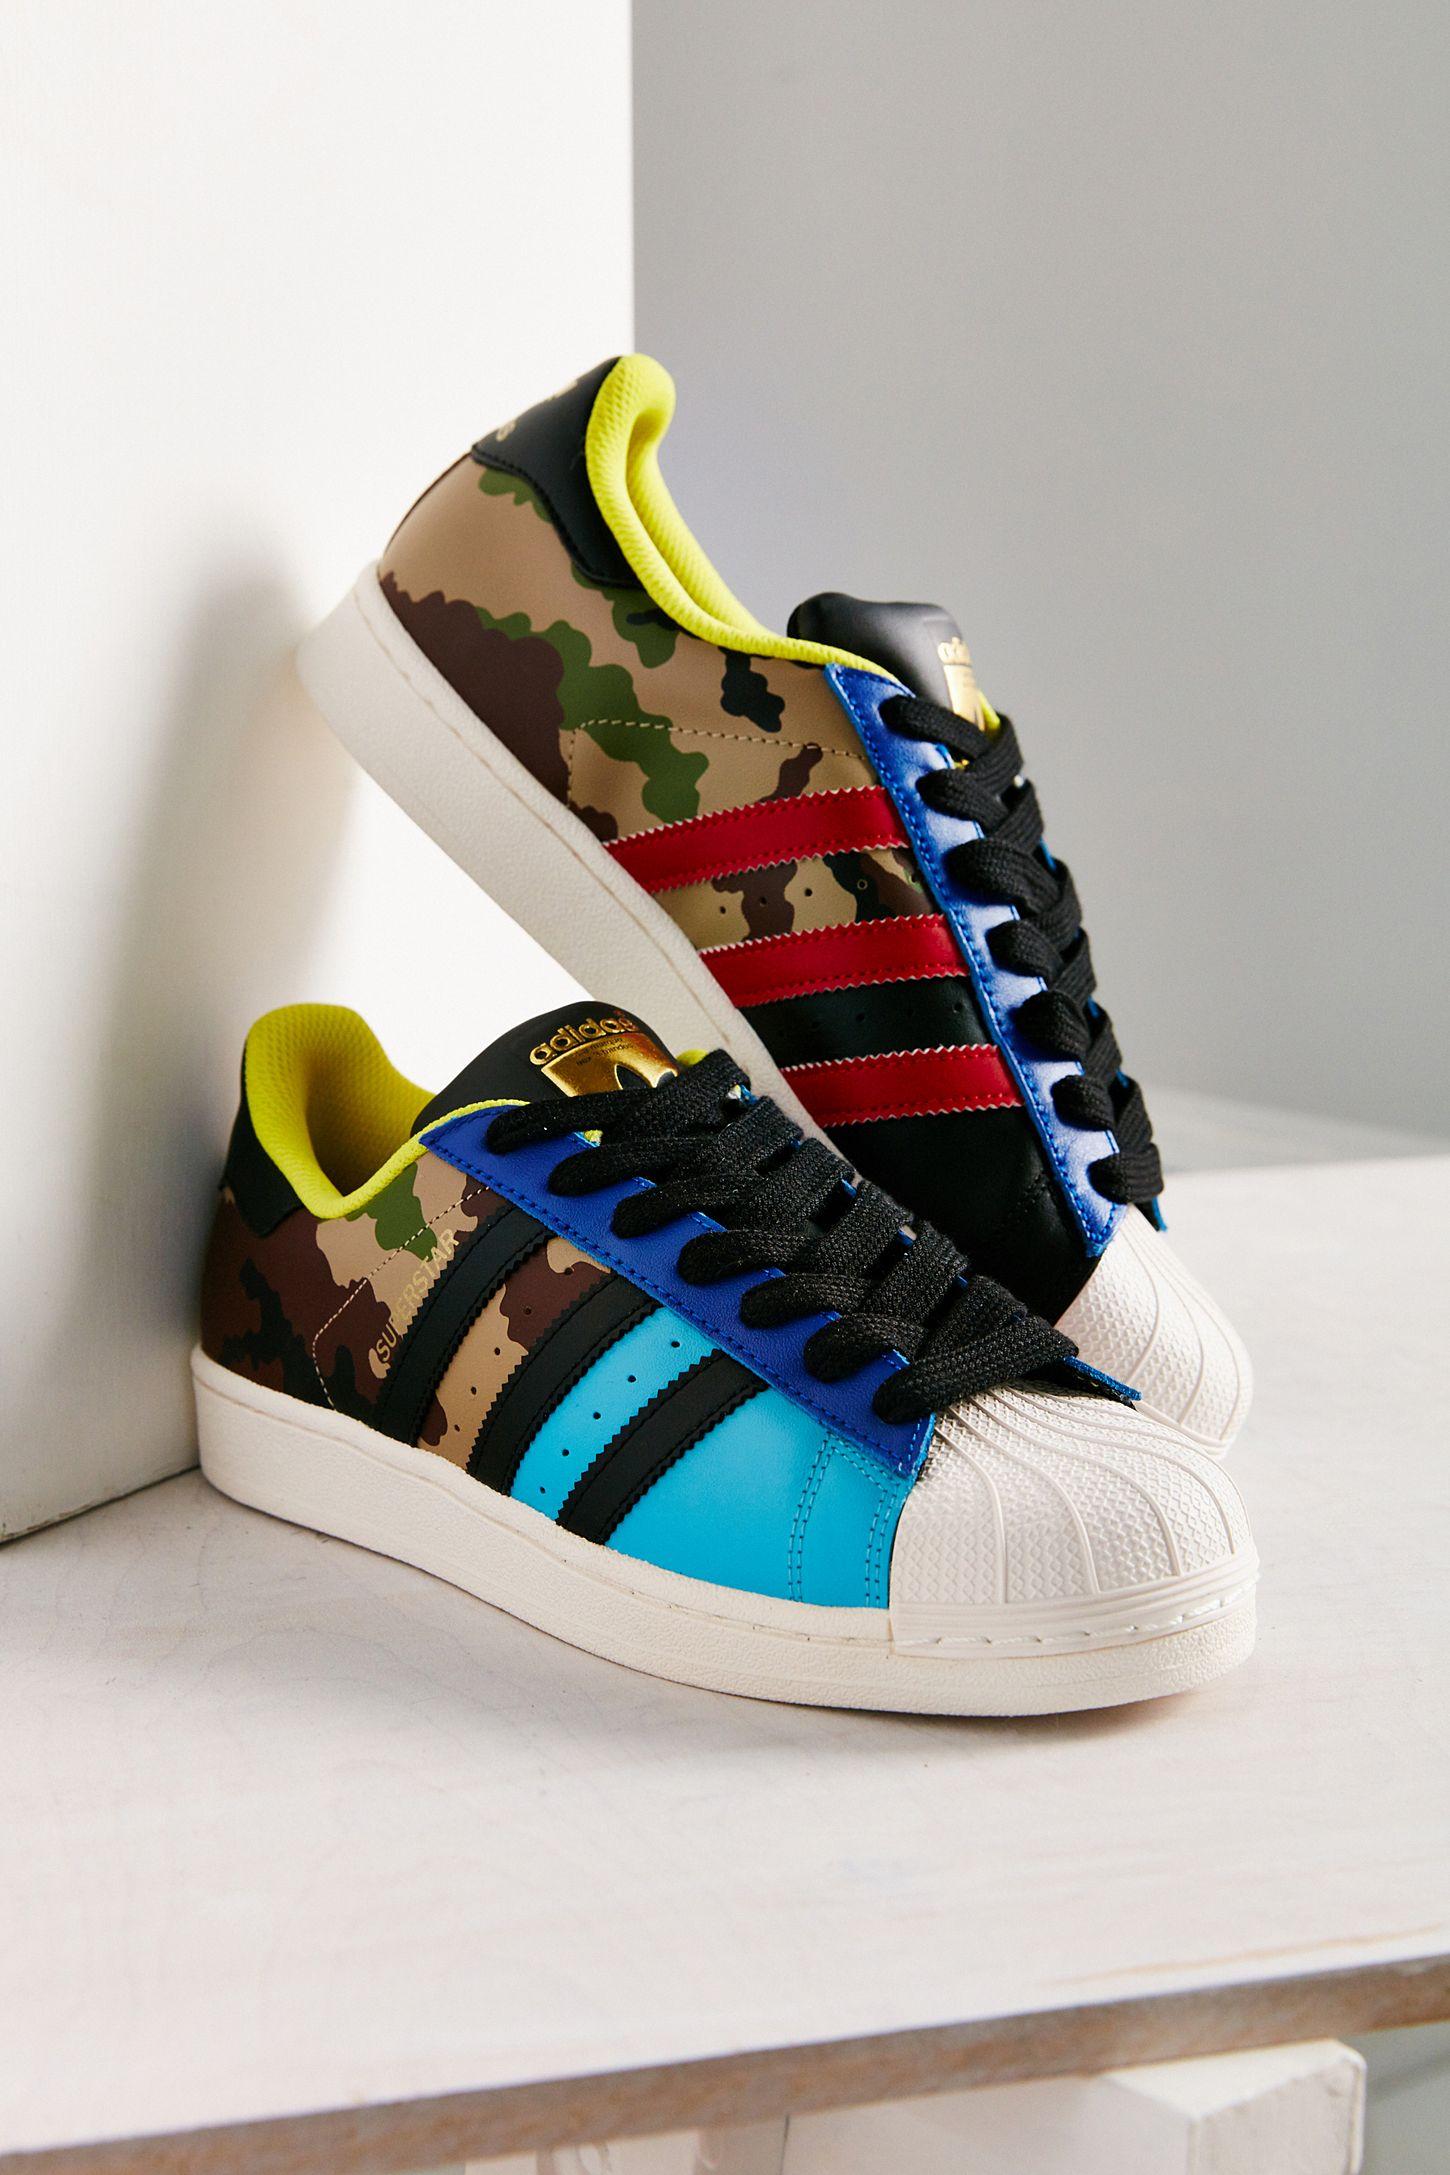 480b4953e748 adidas Originals Superstar Oddity Pack Sneaker